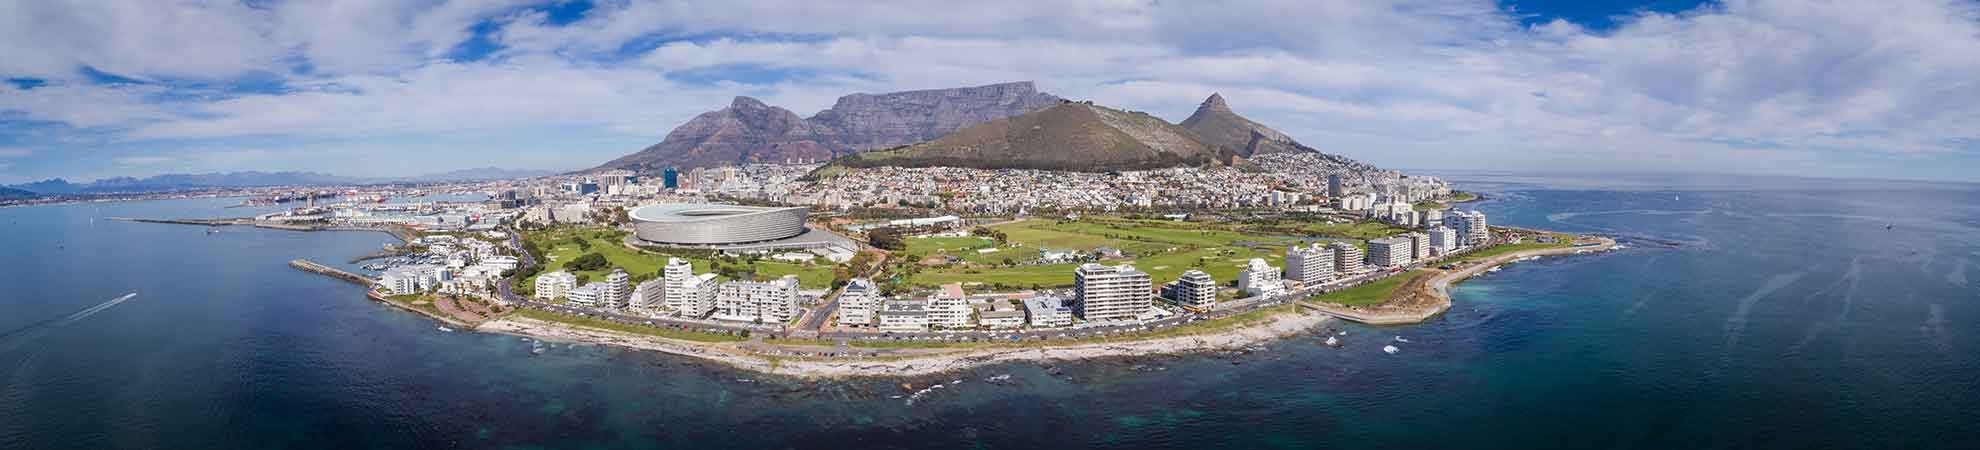 Voyage  Voyage Cape Town